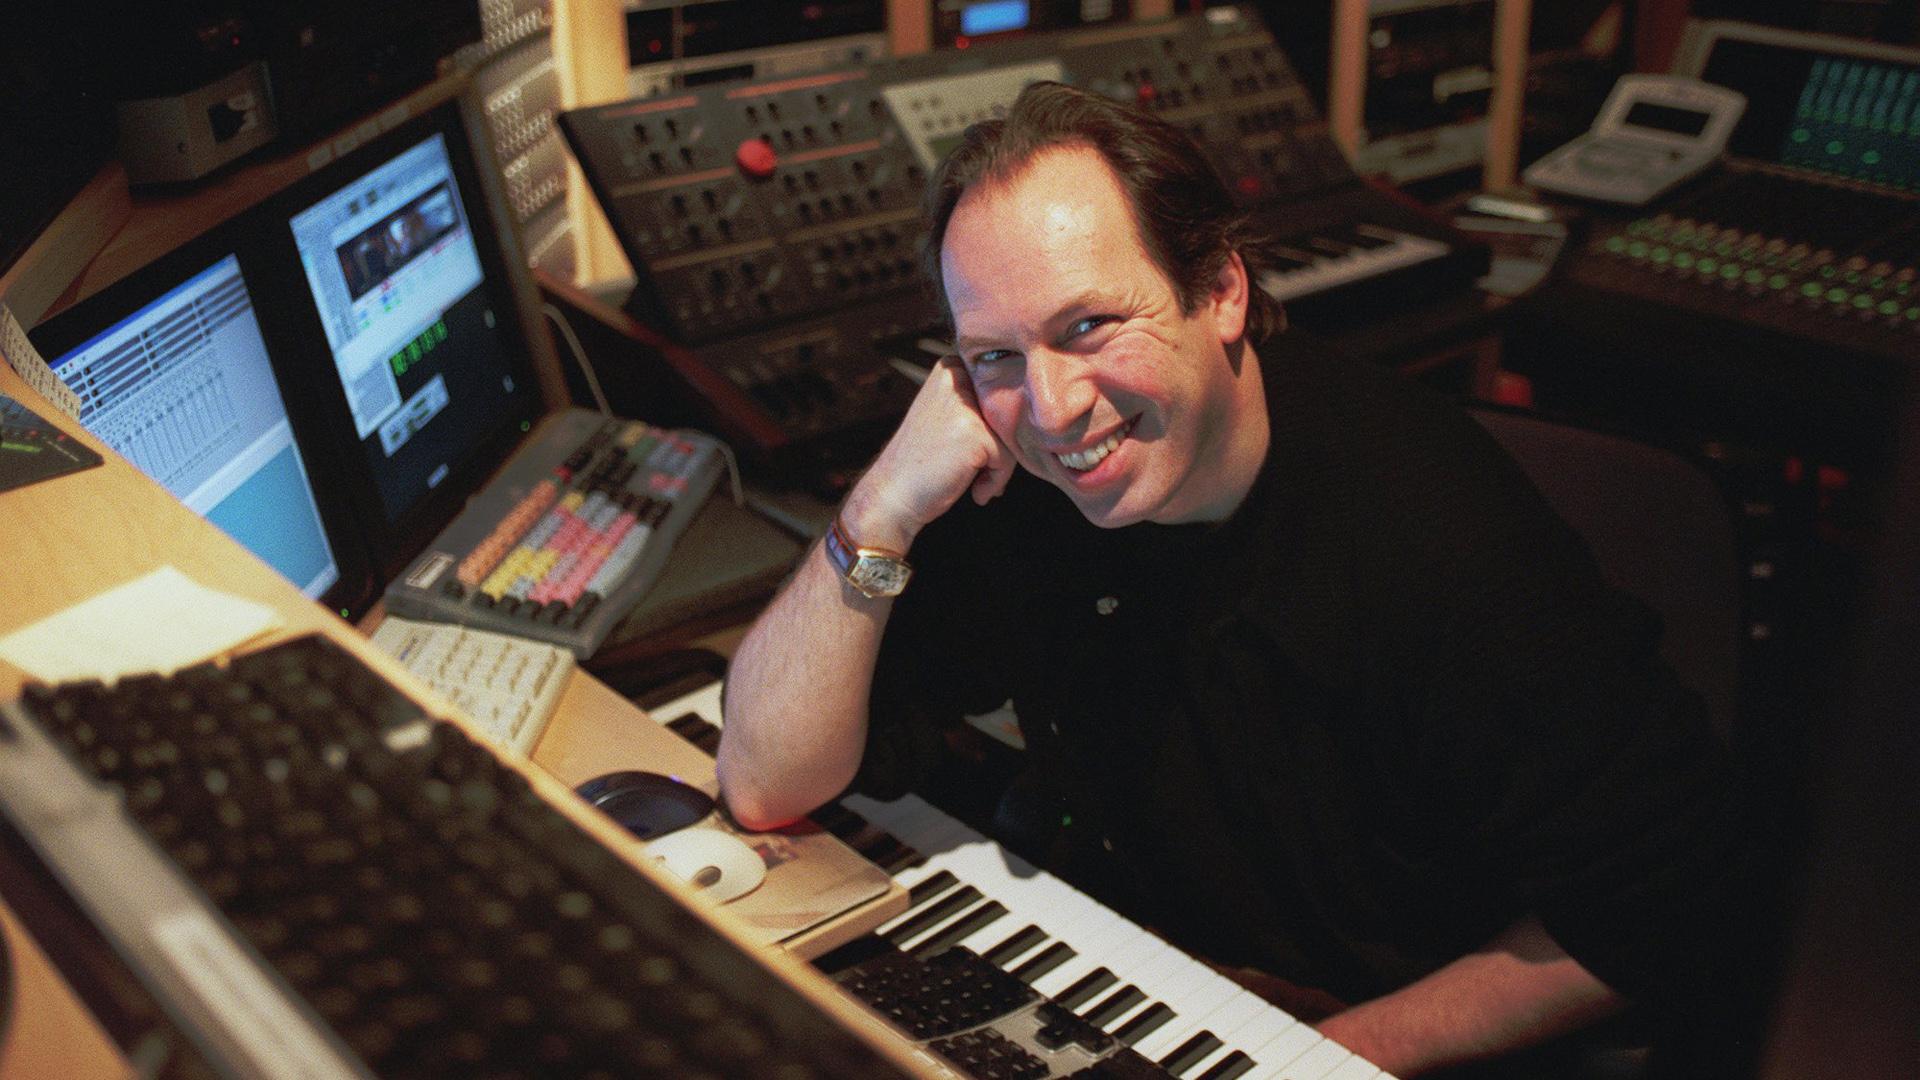 Hans zimmer music fanart for Zimmer 0 studios elda